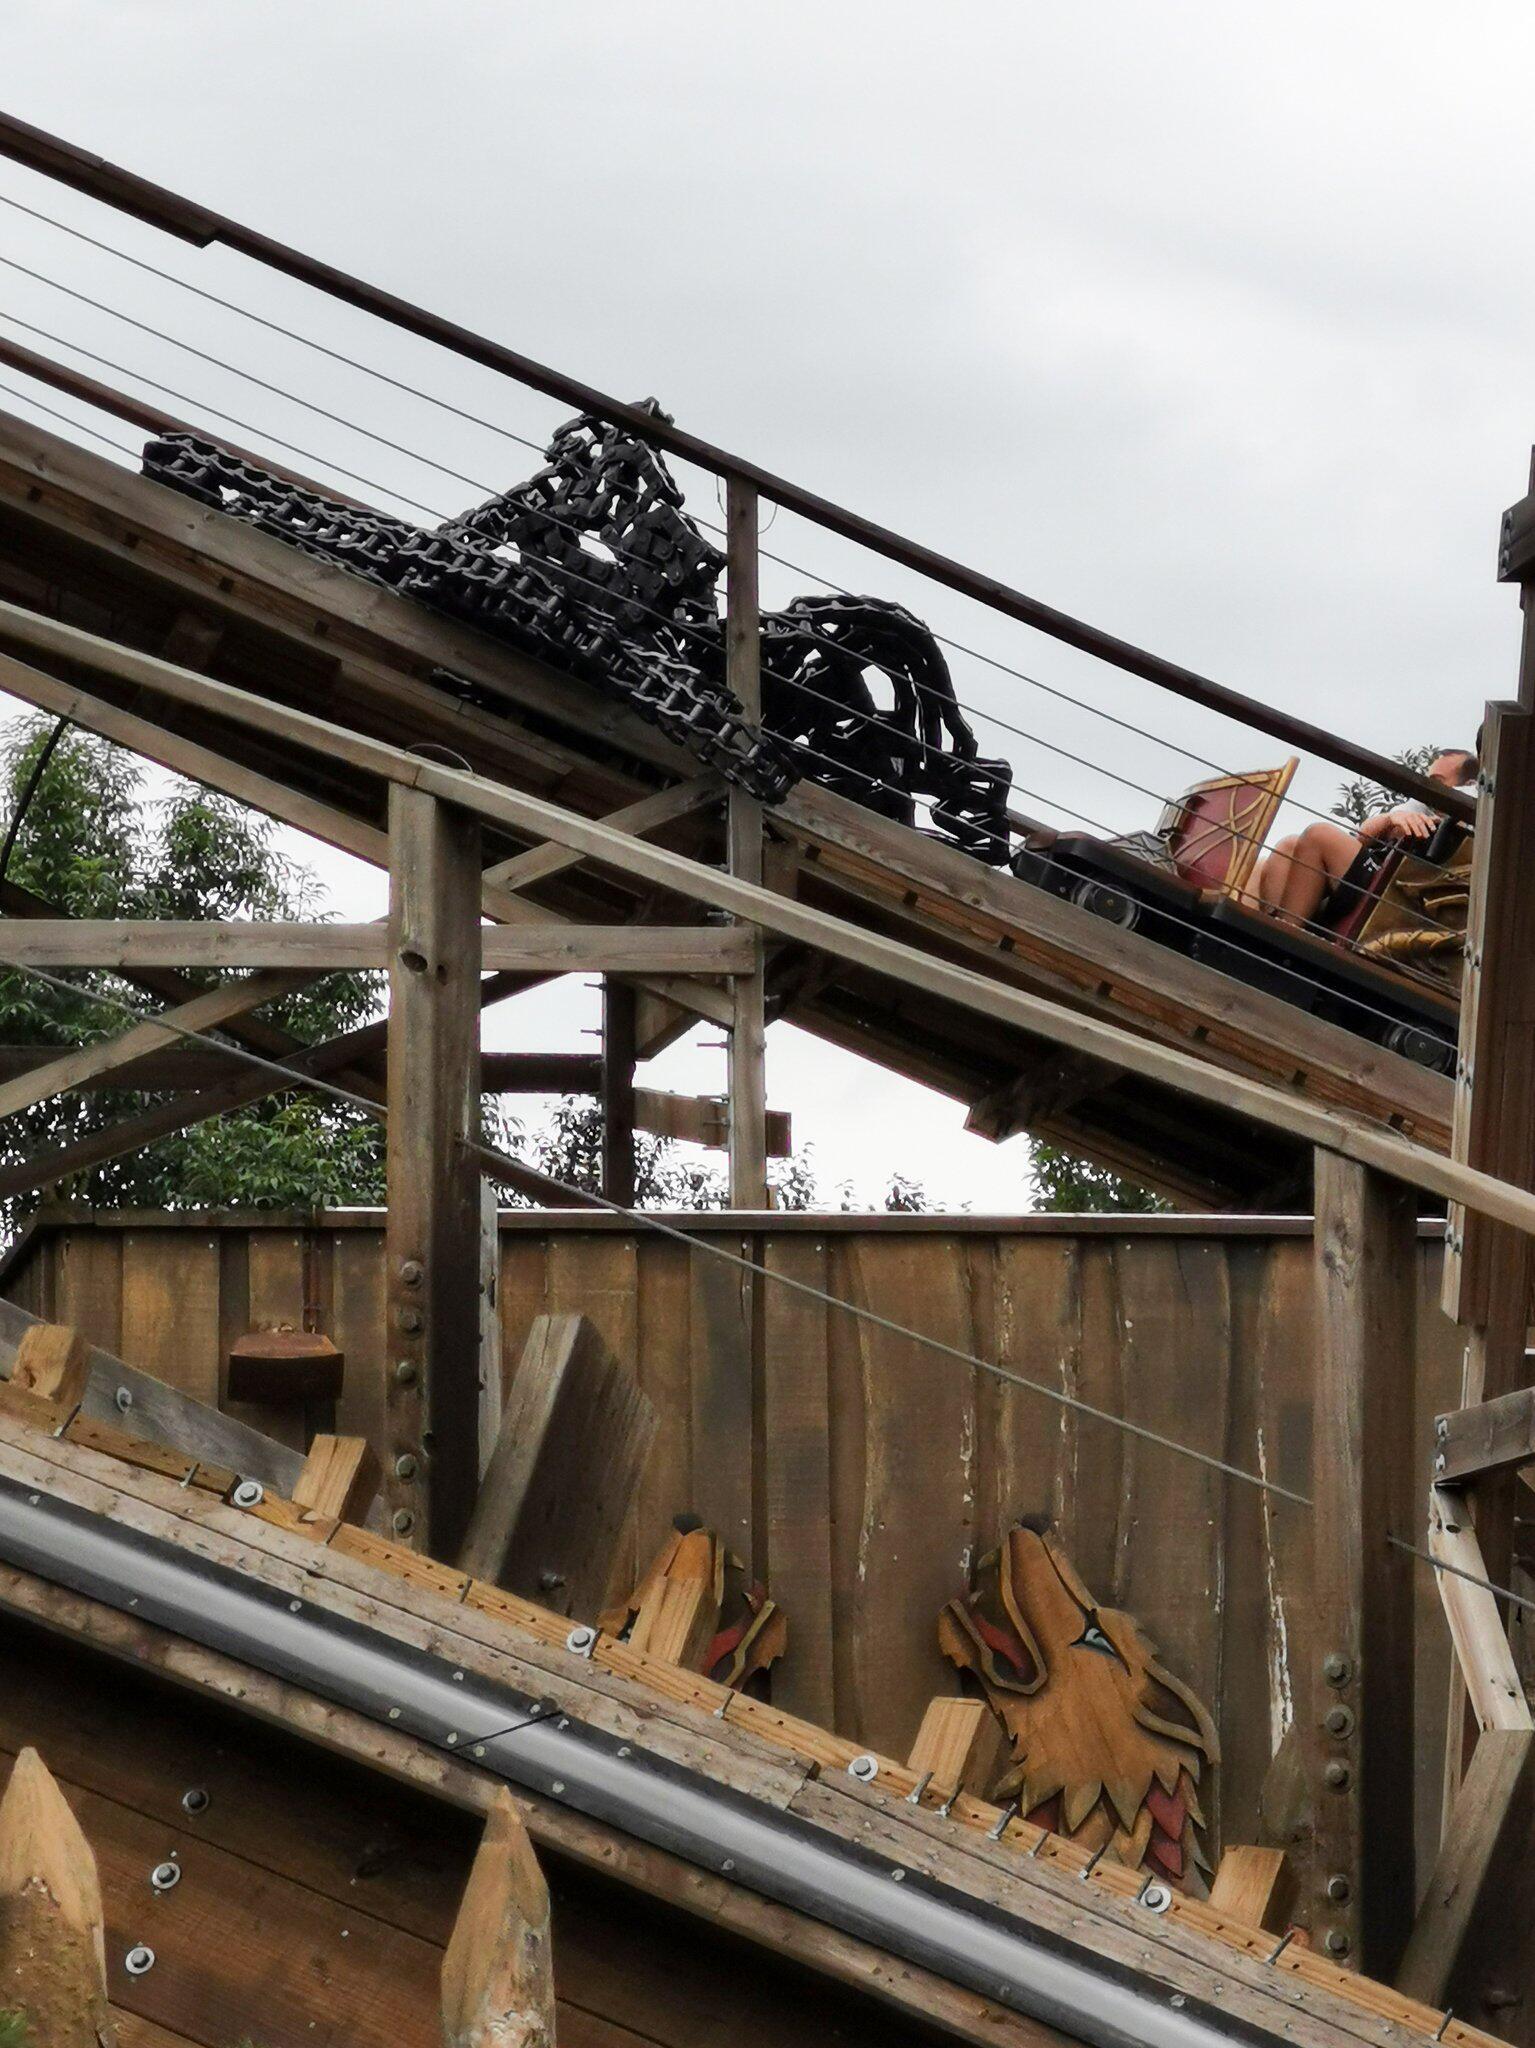 Bild zu Holzachterbahn Wodan